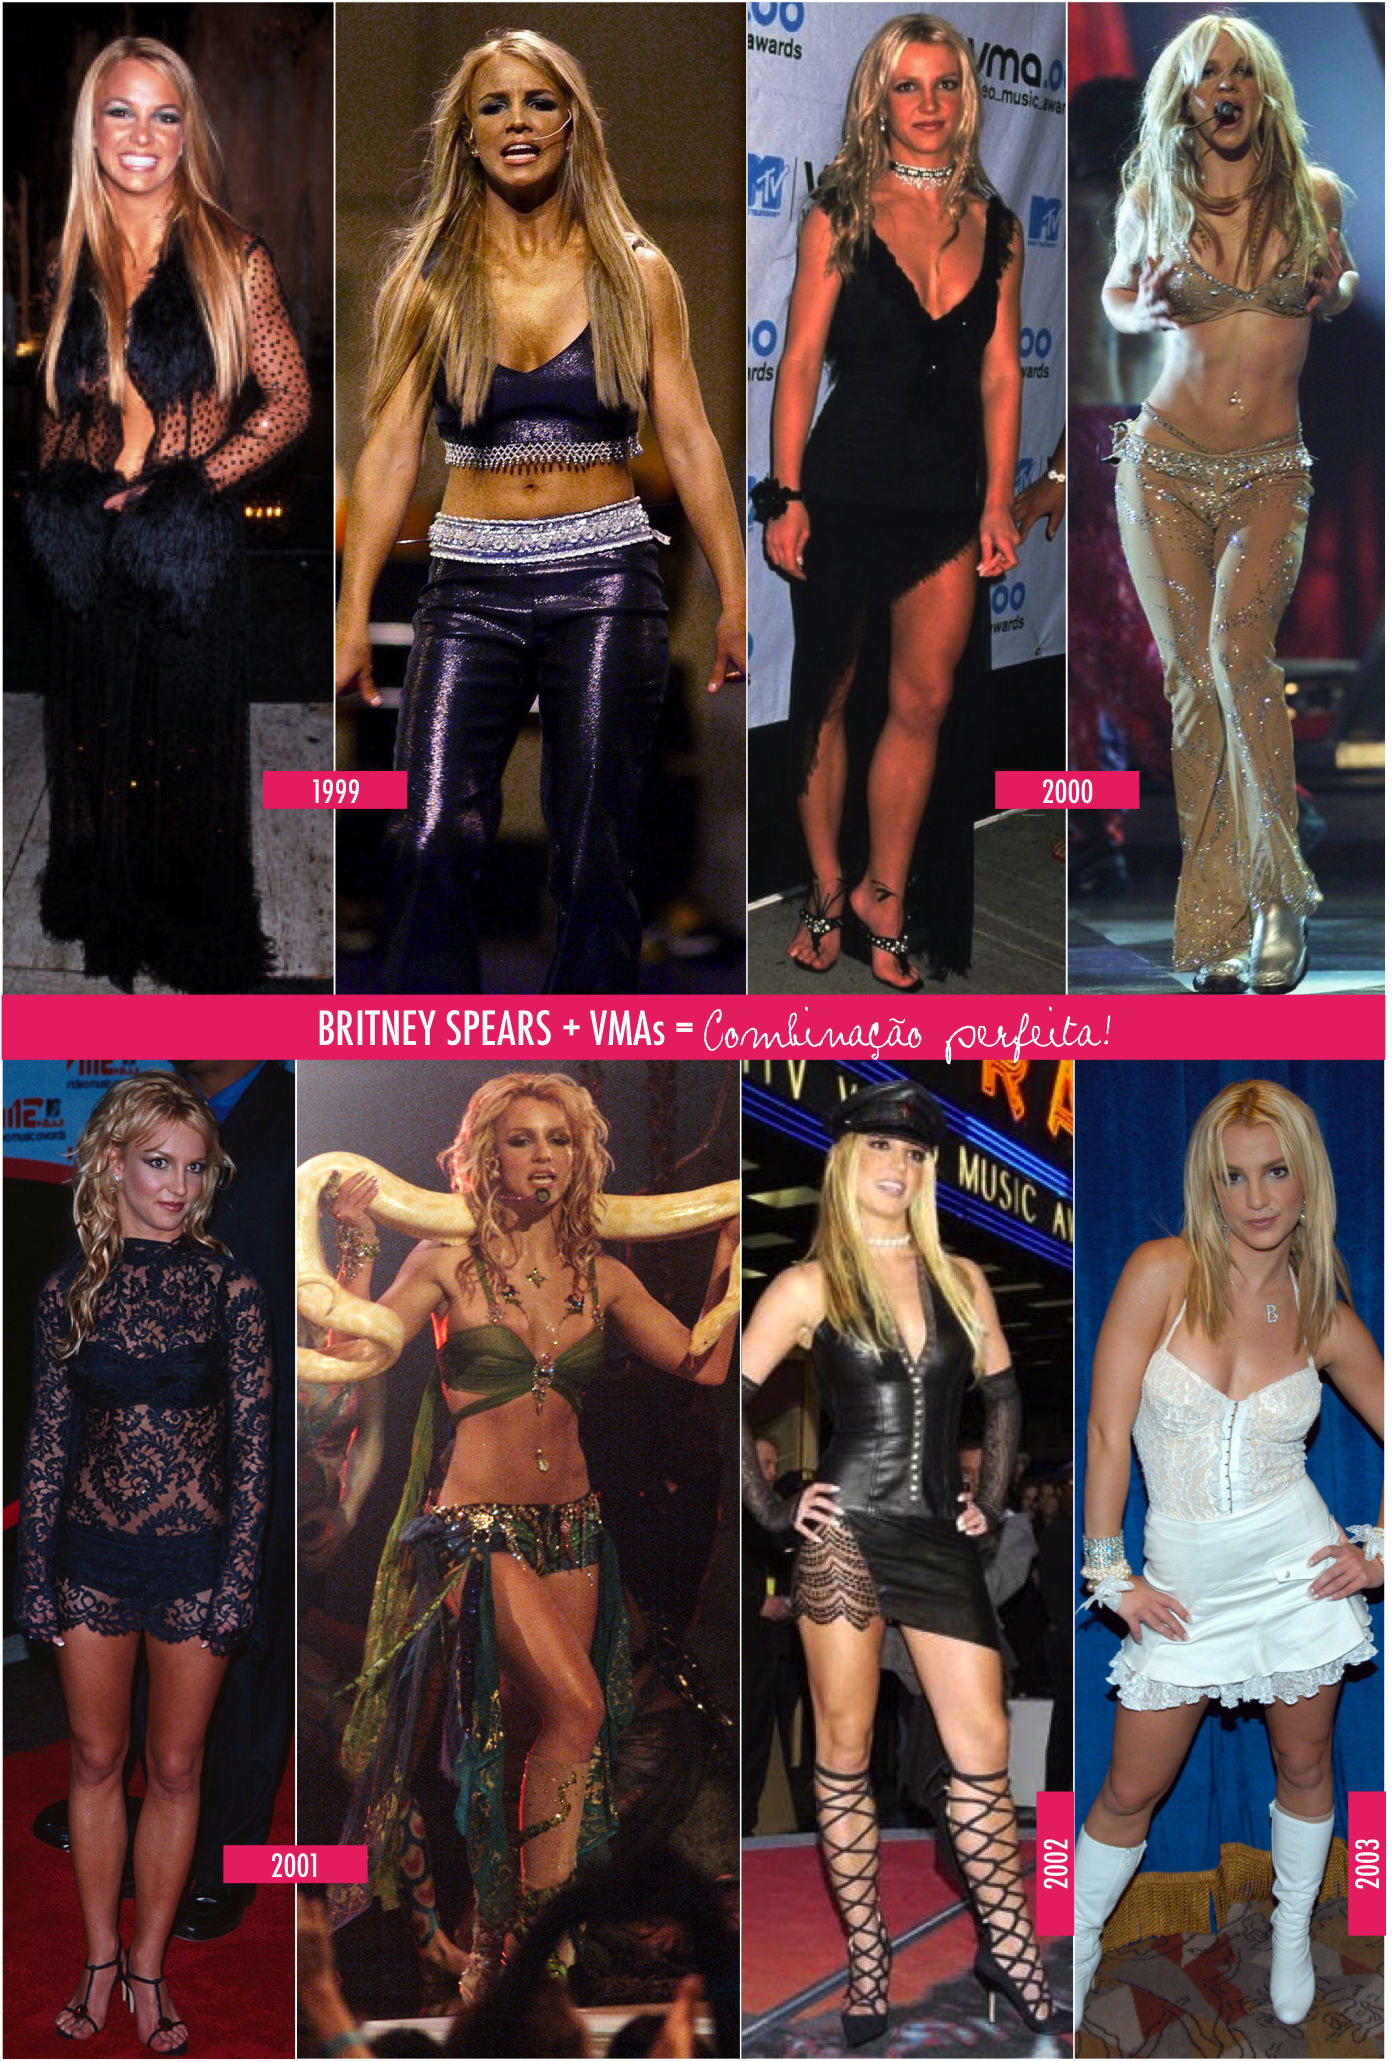 Os looks mais marcantes da Britney!